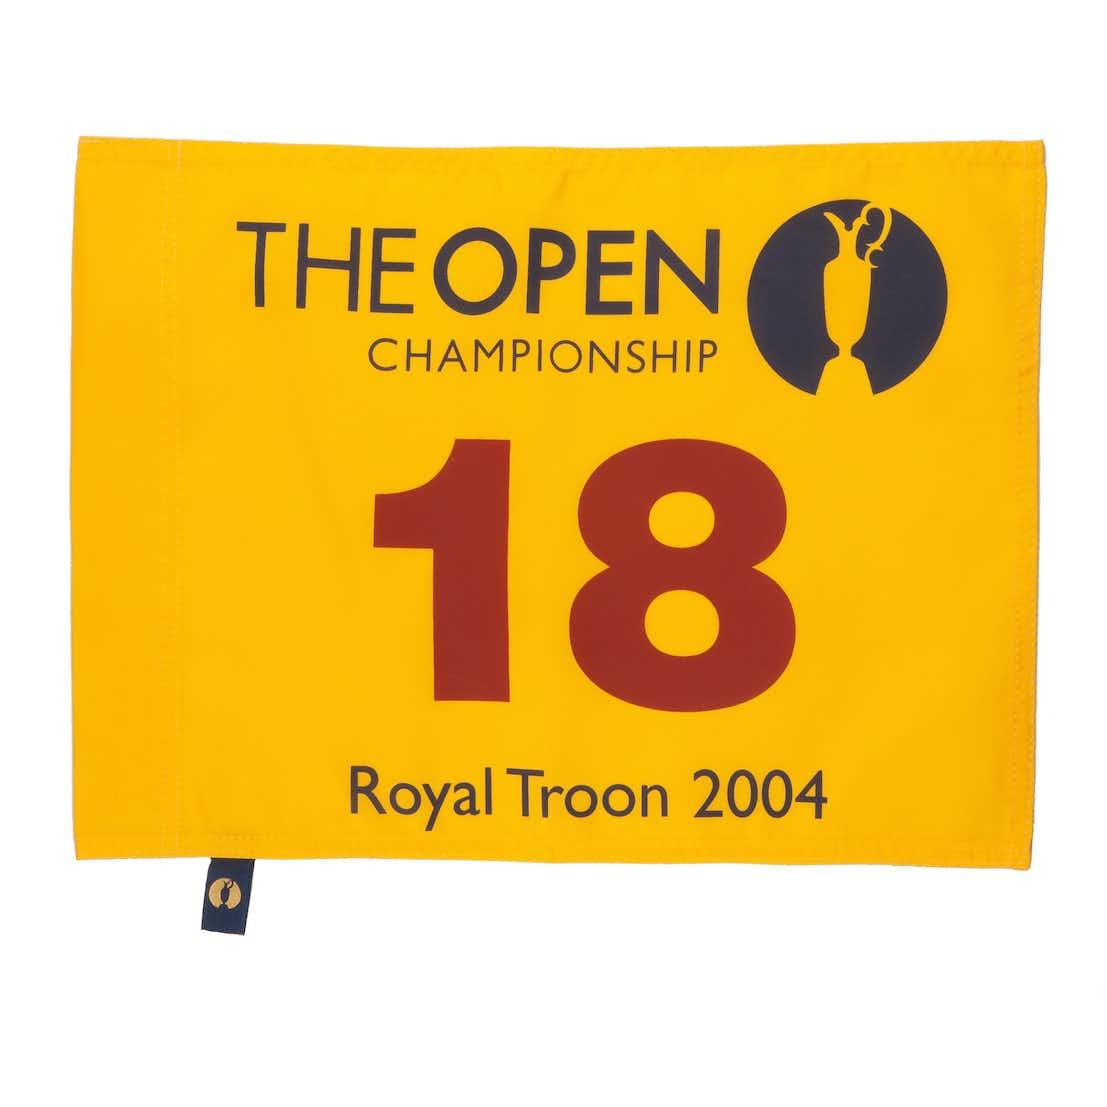 133rd Royal Troon Open Championship Pin Flag - Yellow